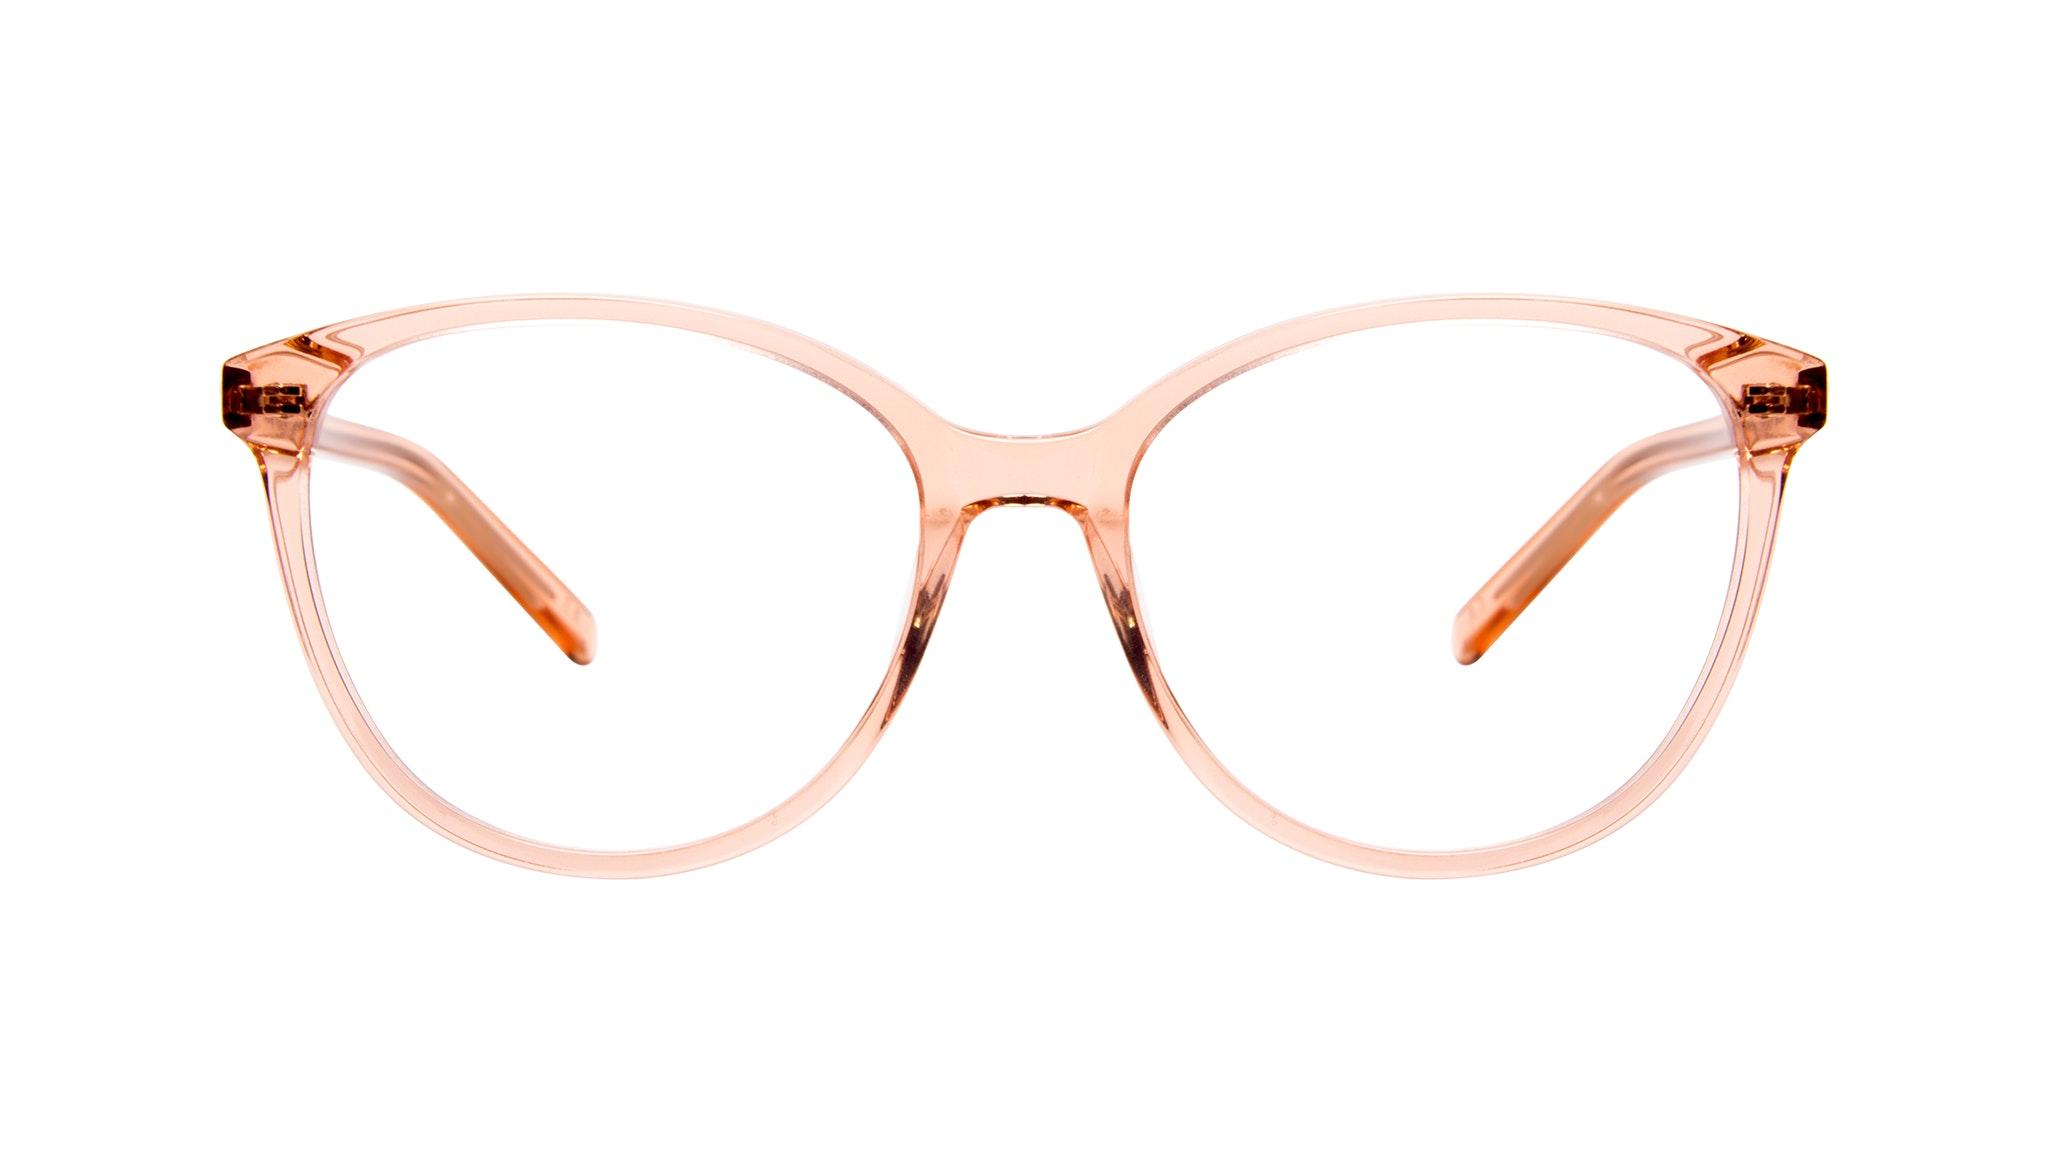 Affordable Fashion Glasses Round Eyeglasses Women Imagine Peach